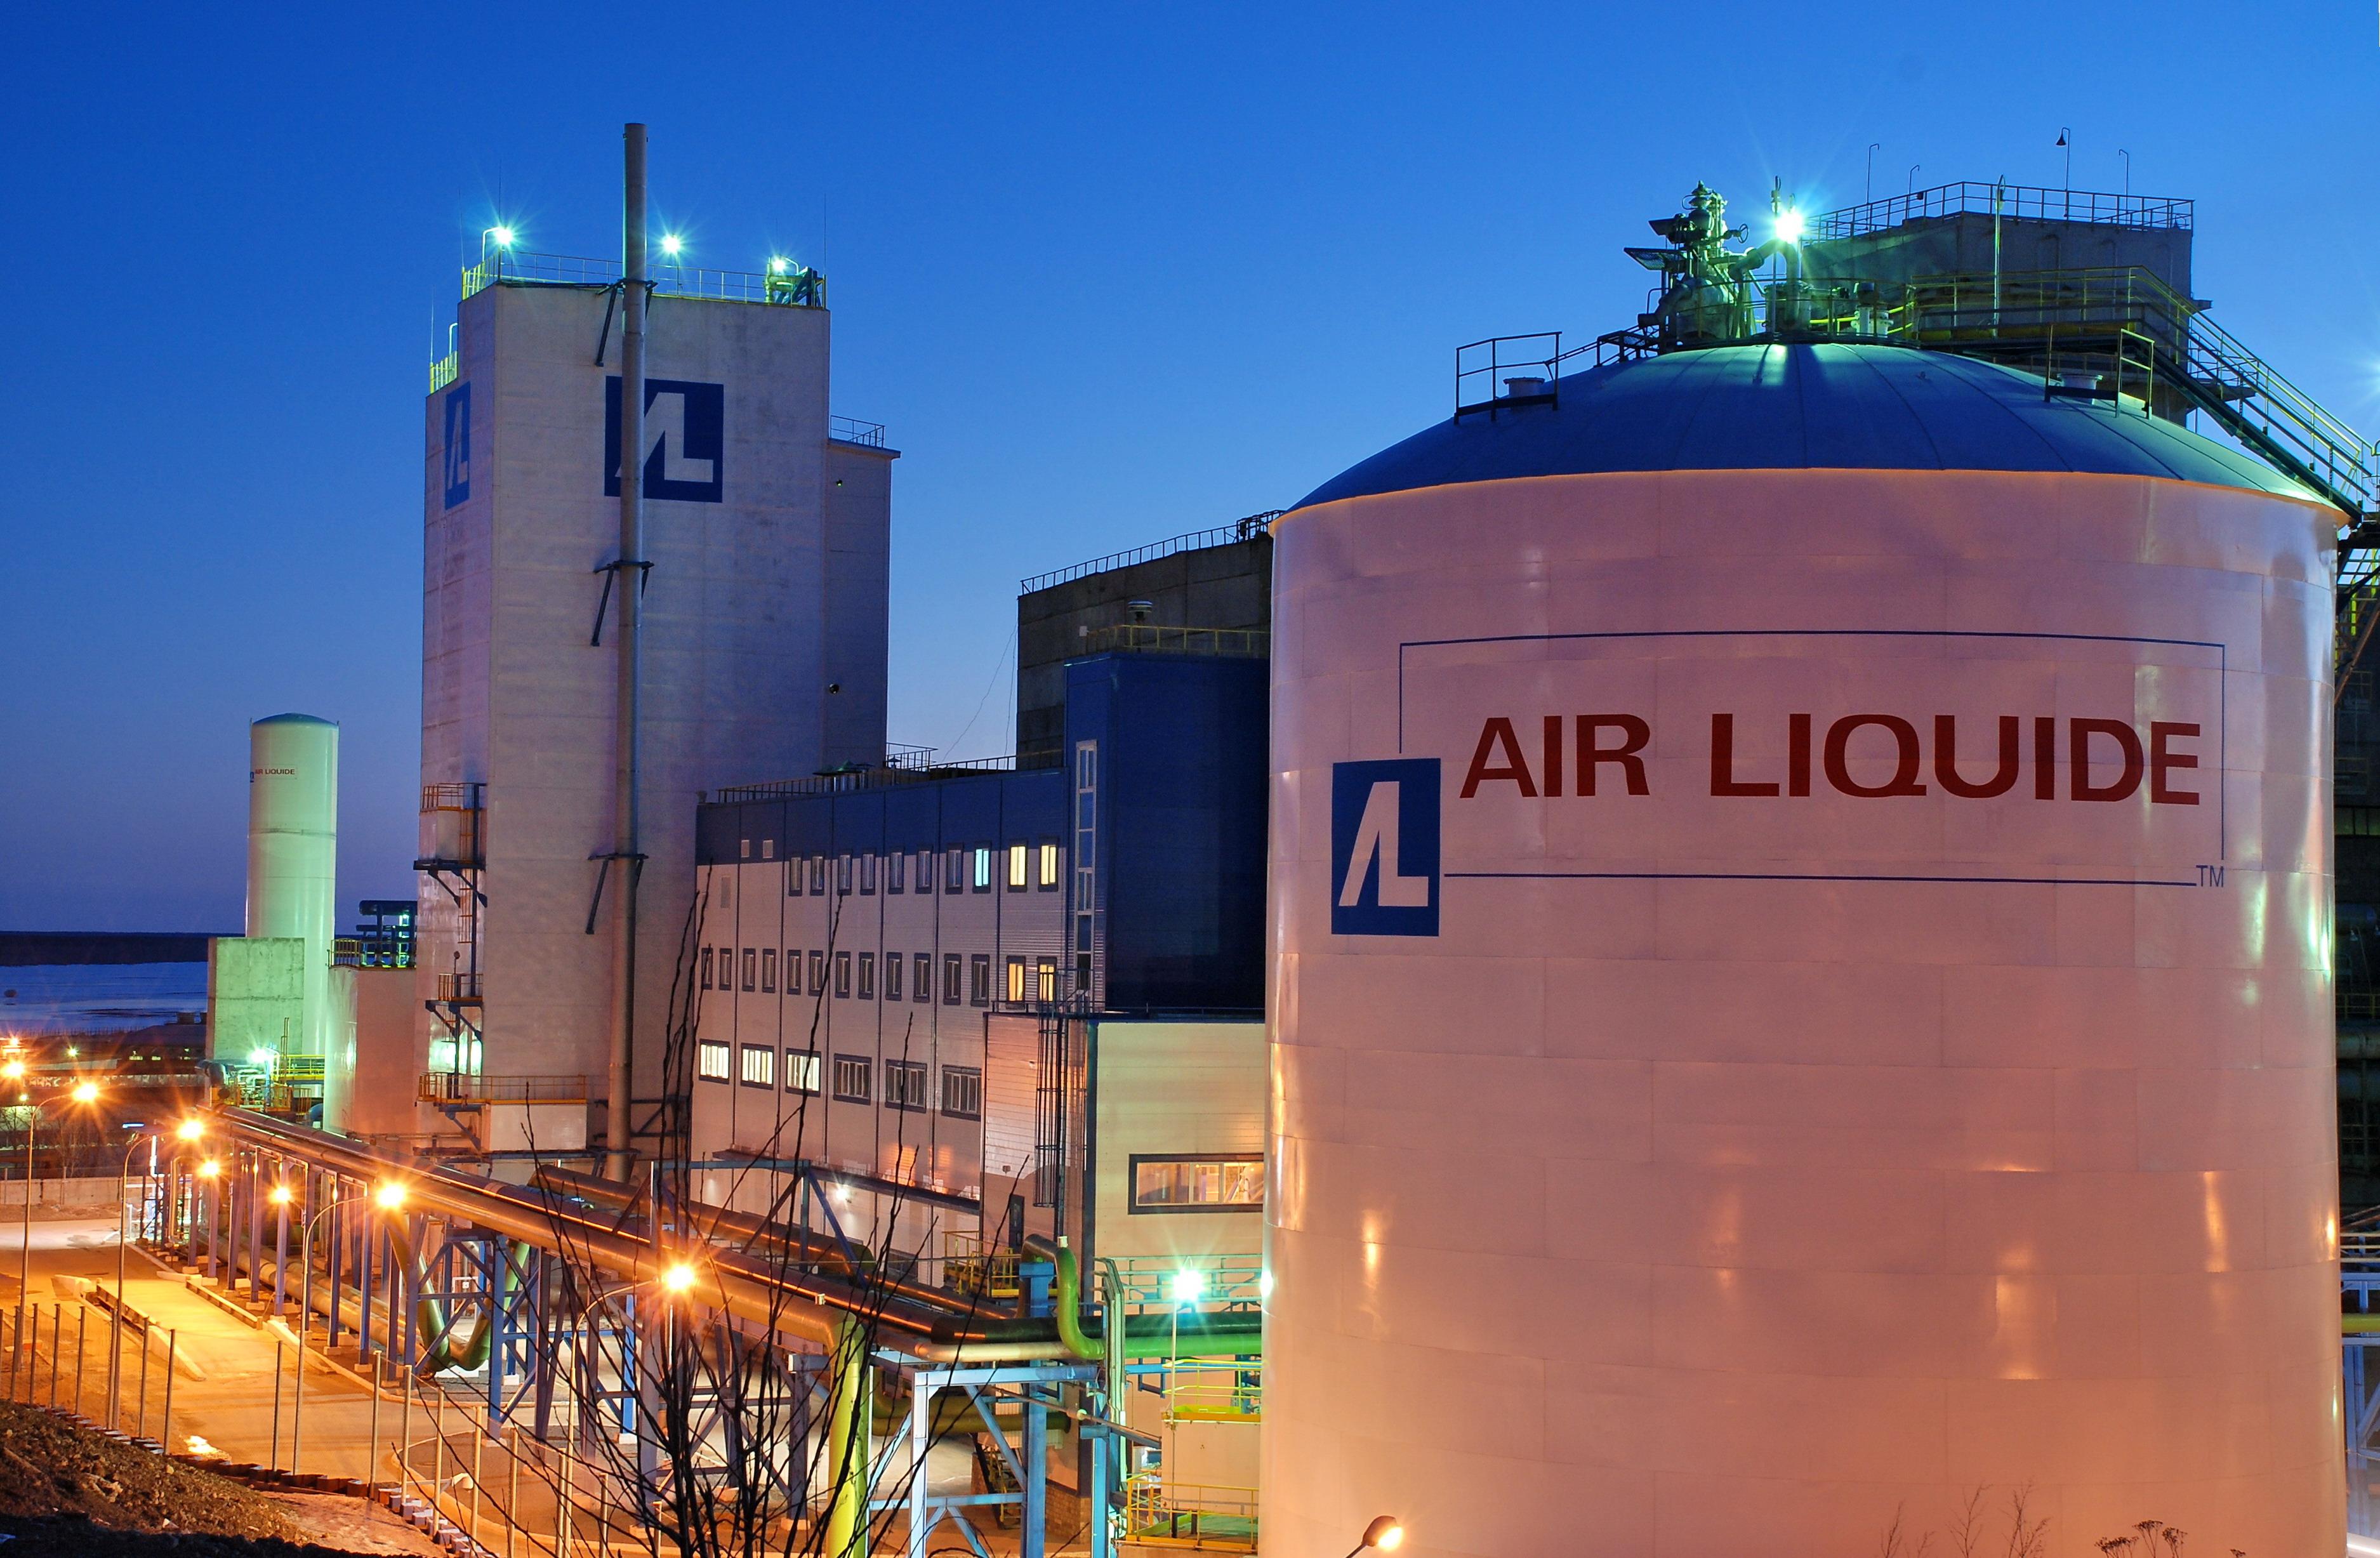 Air-Liquide_Fujian-Shenyuan_caprolactam_Project